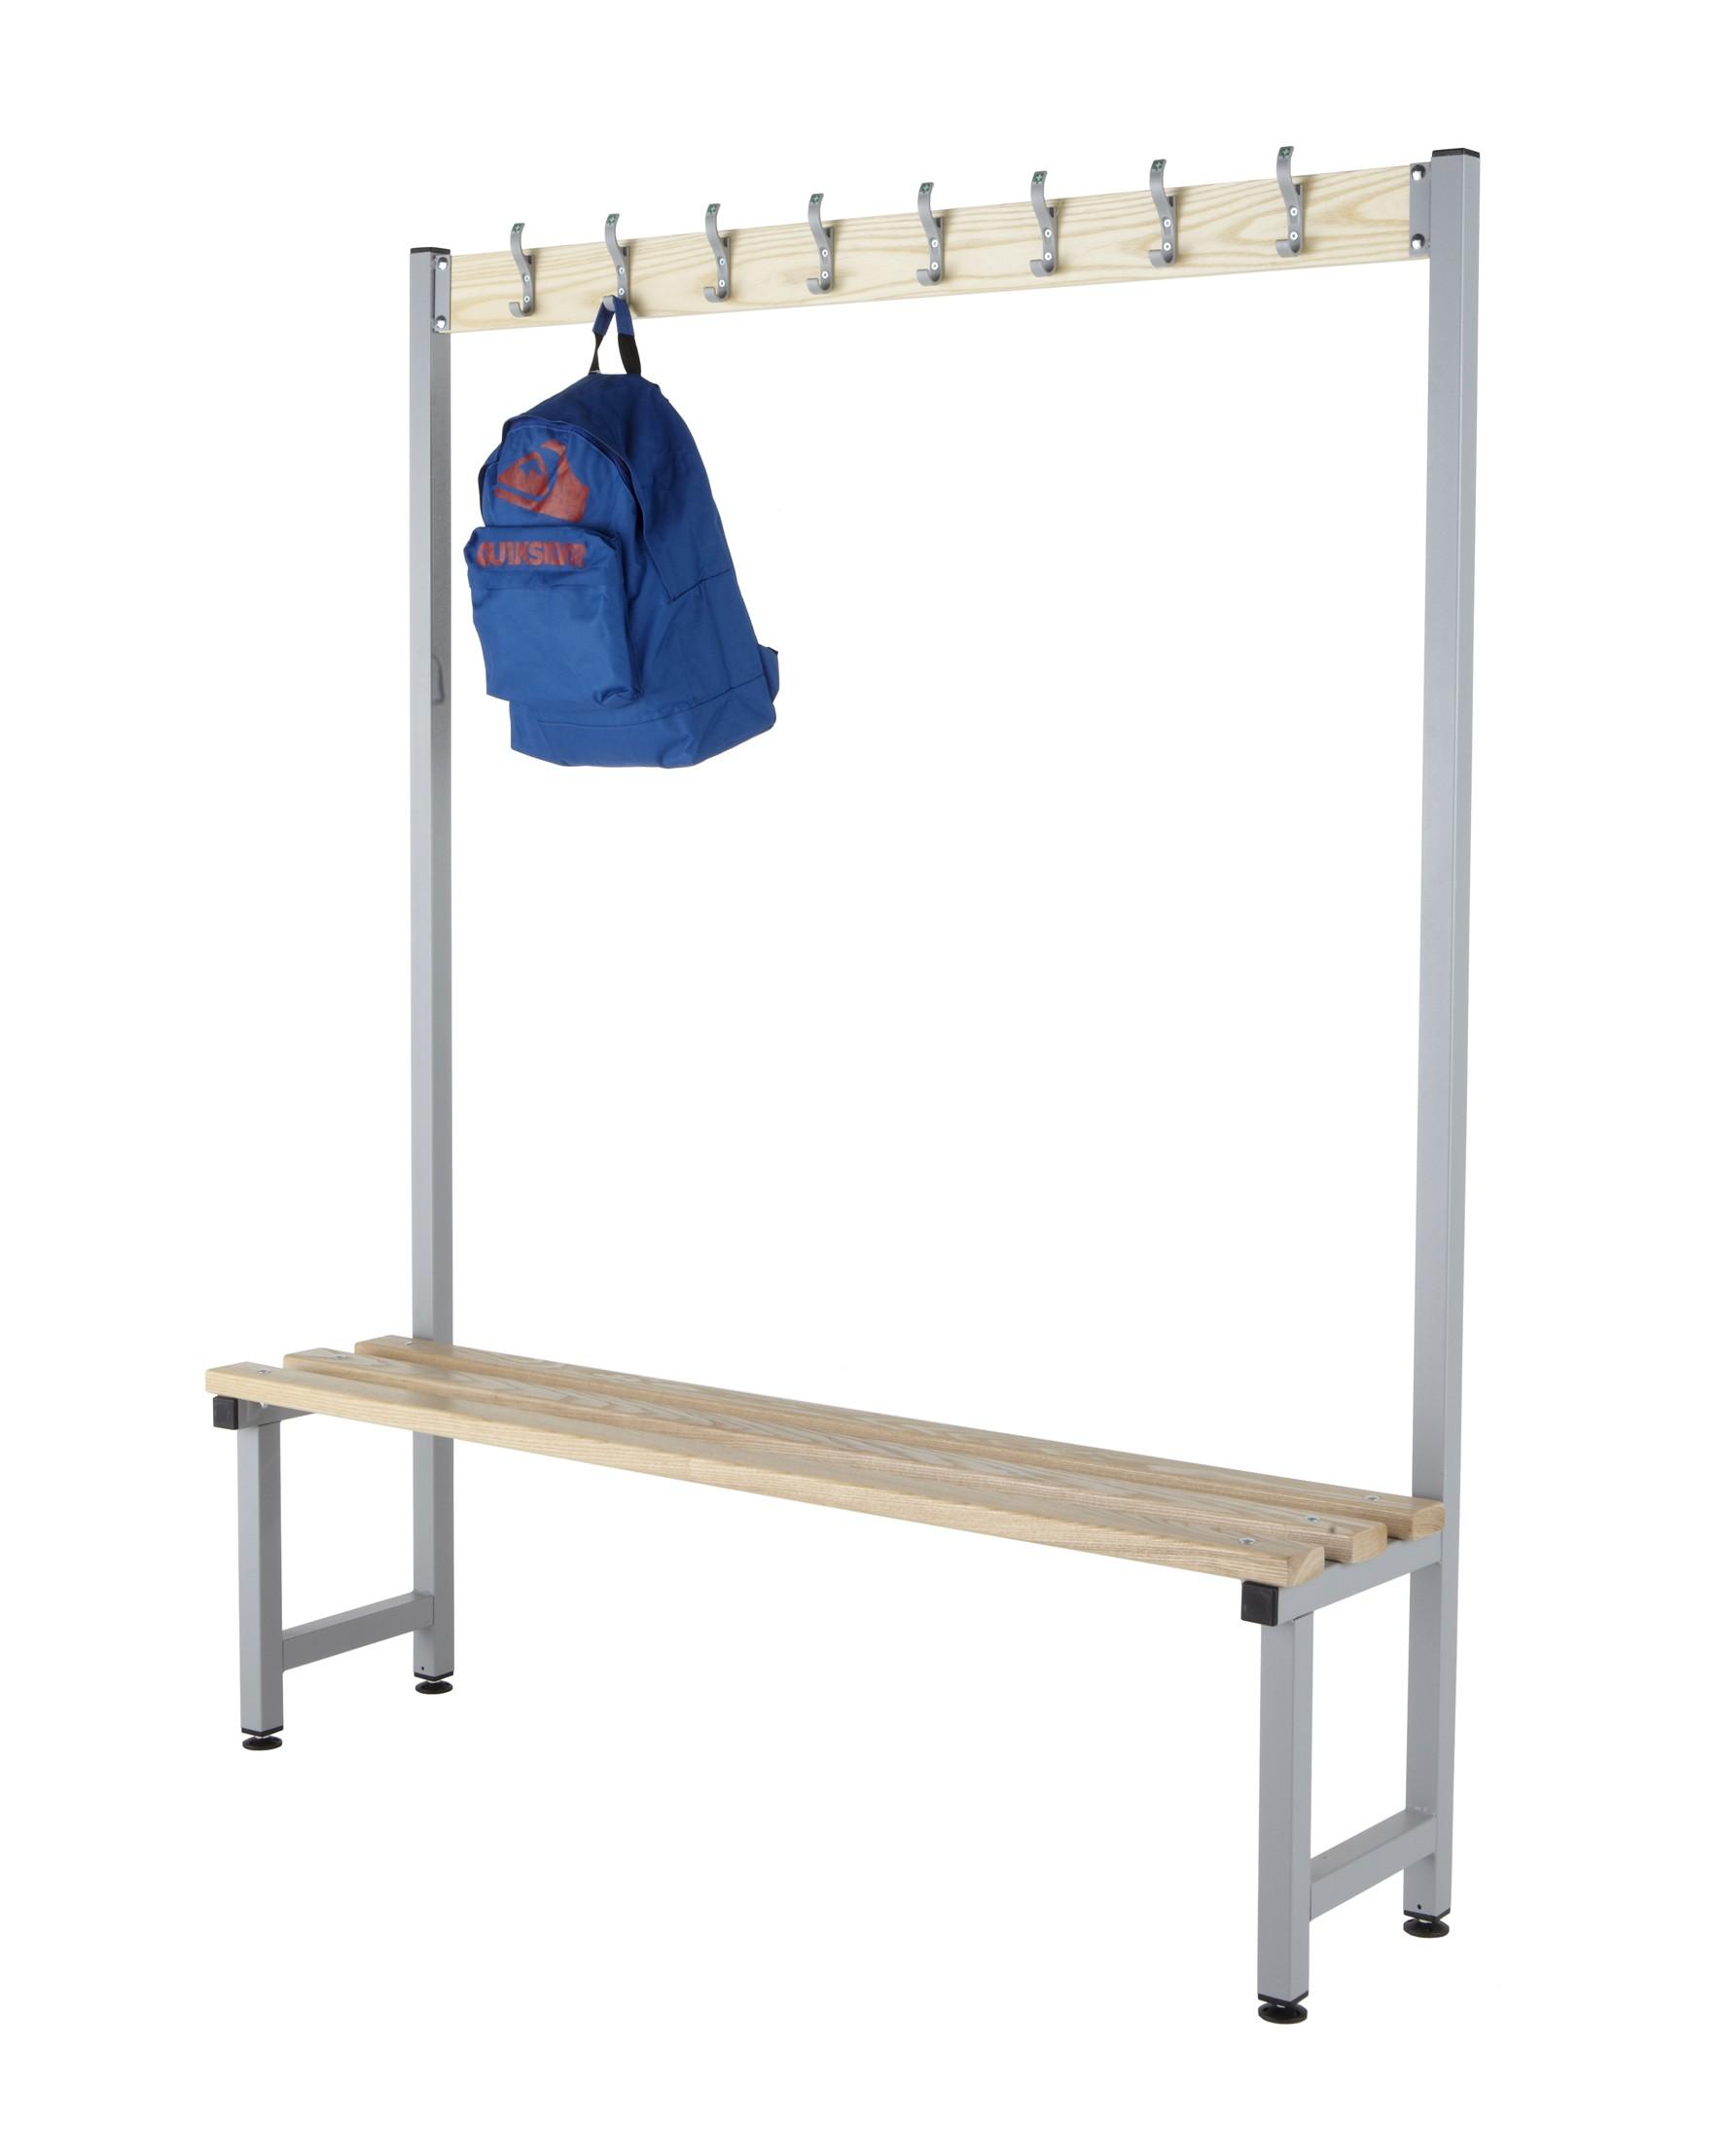 Single Sided Hook Bench - Type J